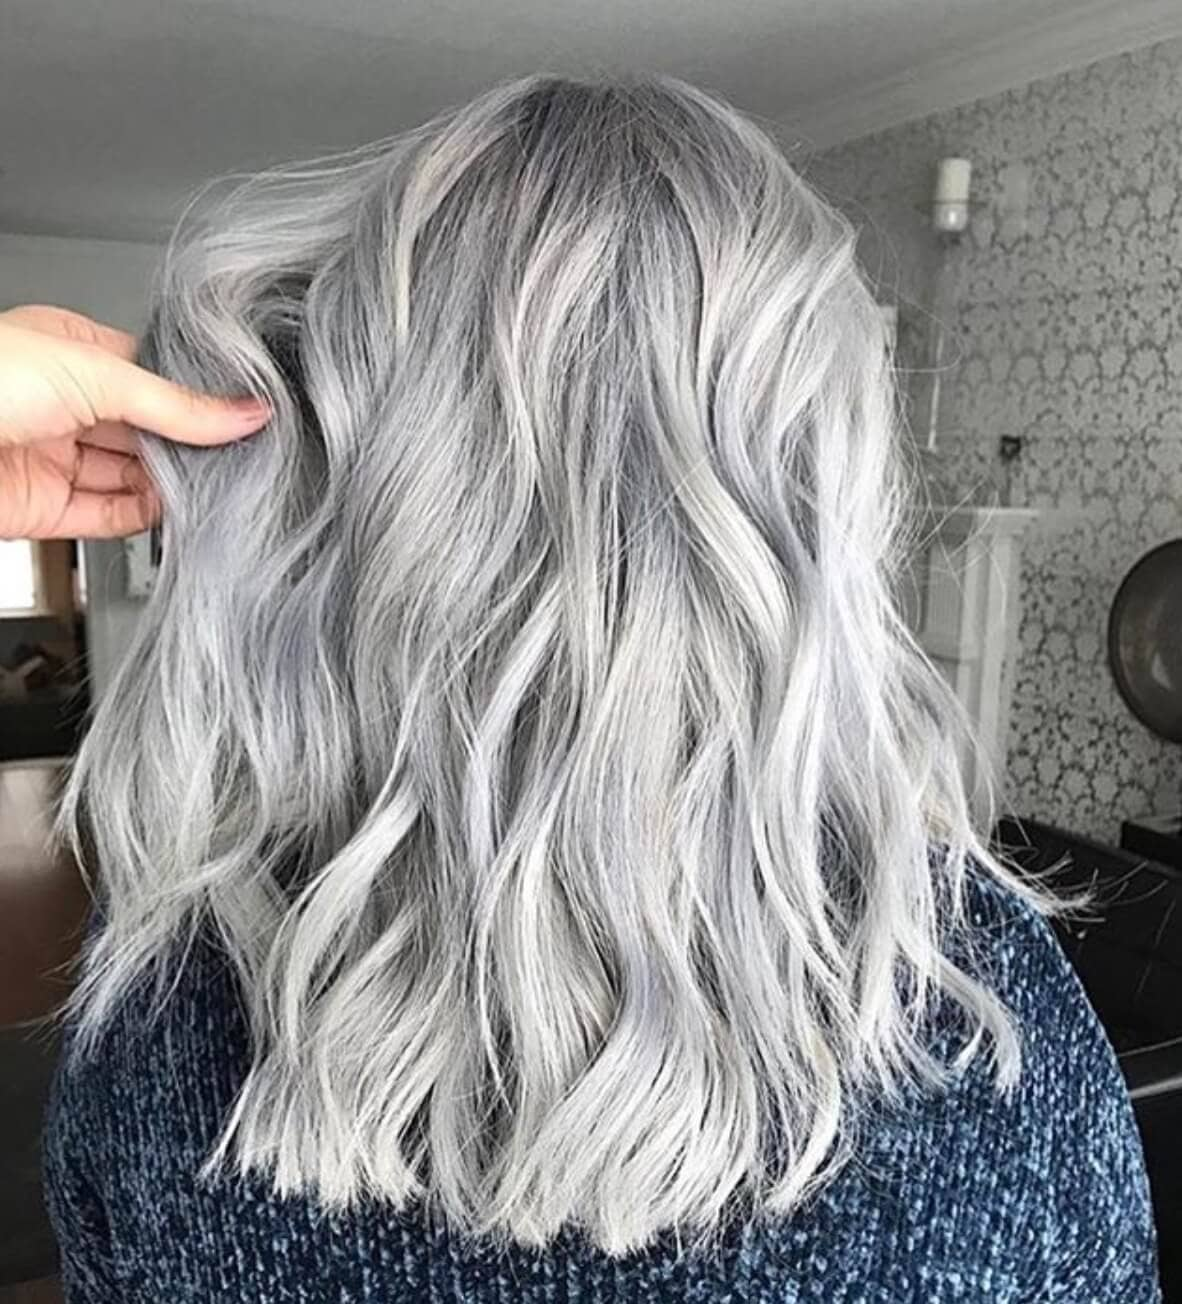 25 silver hair color